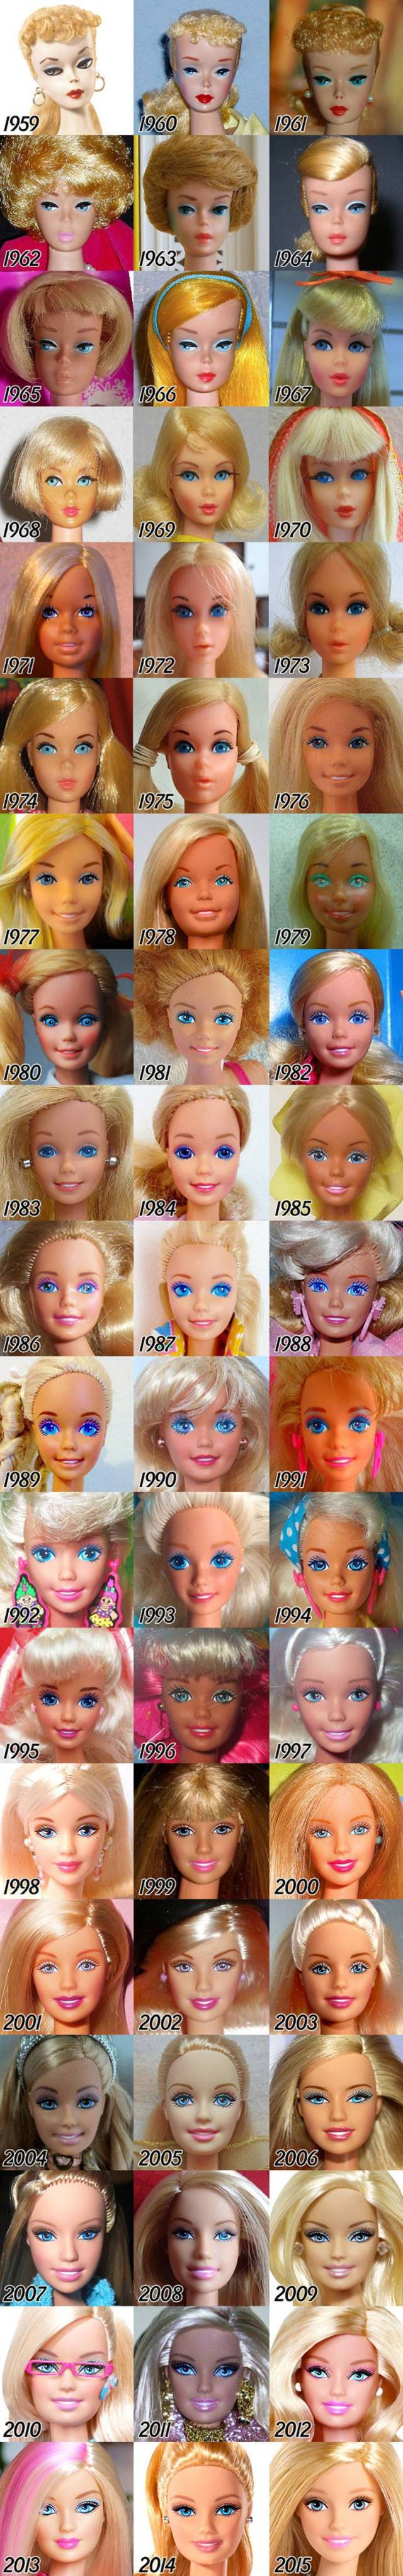 Barbie through the years.jpg